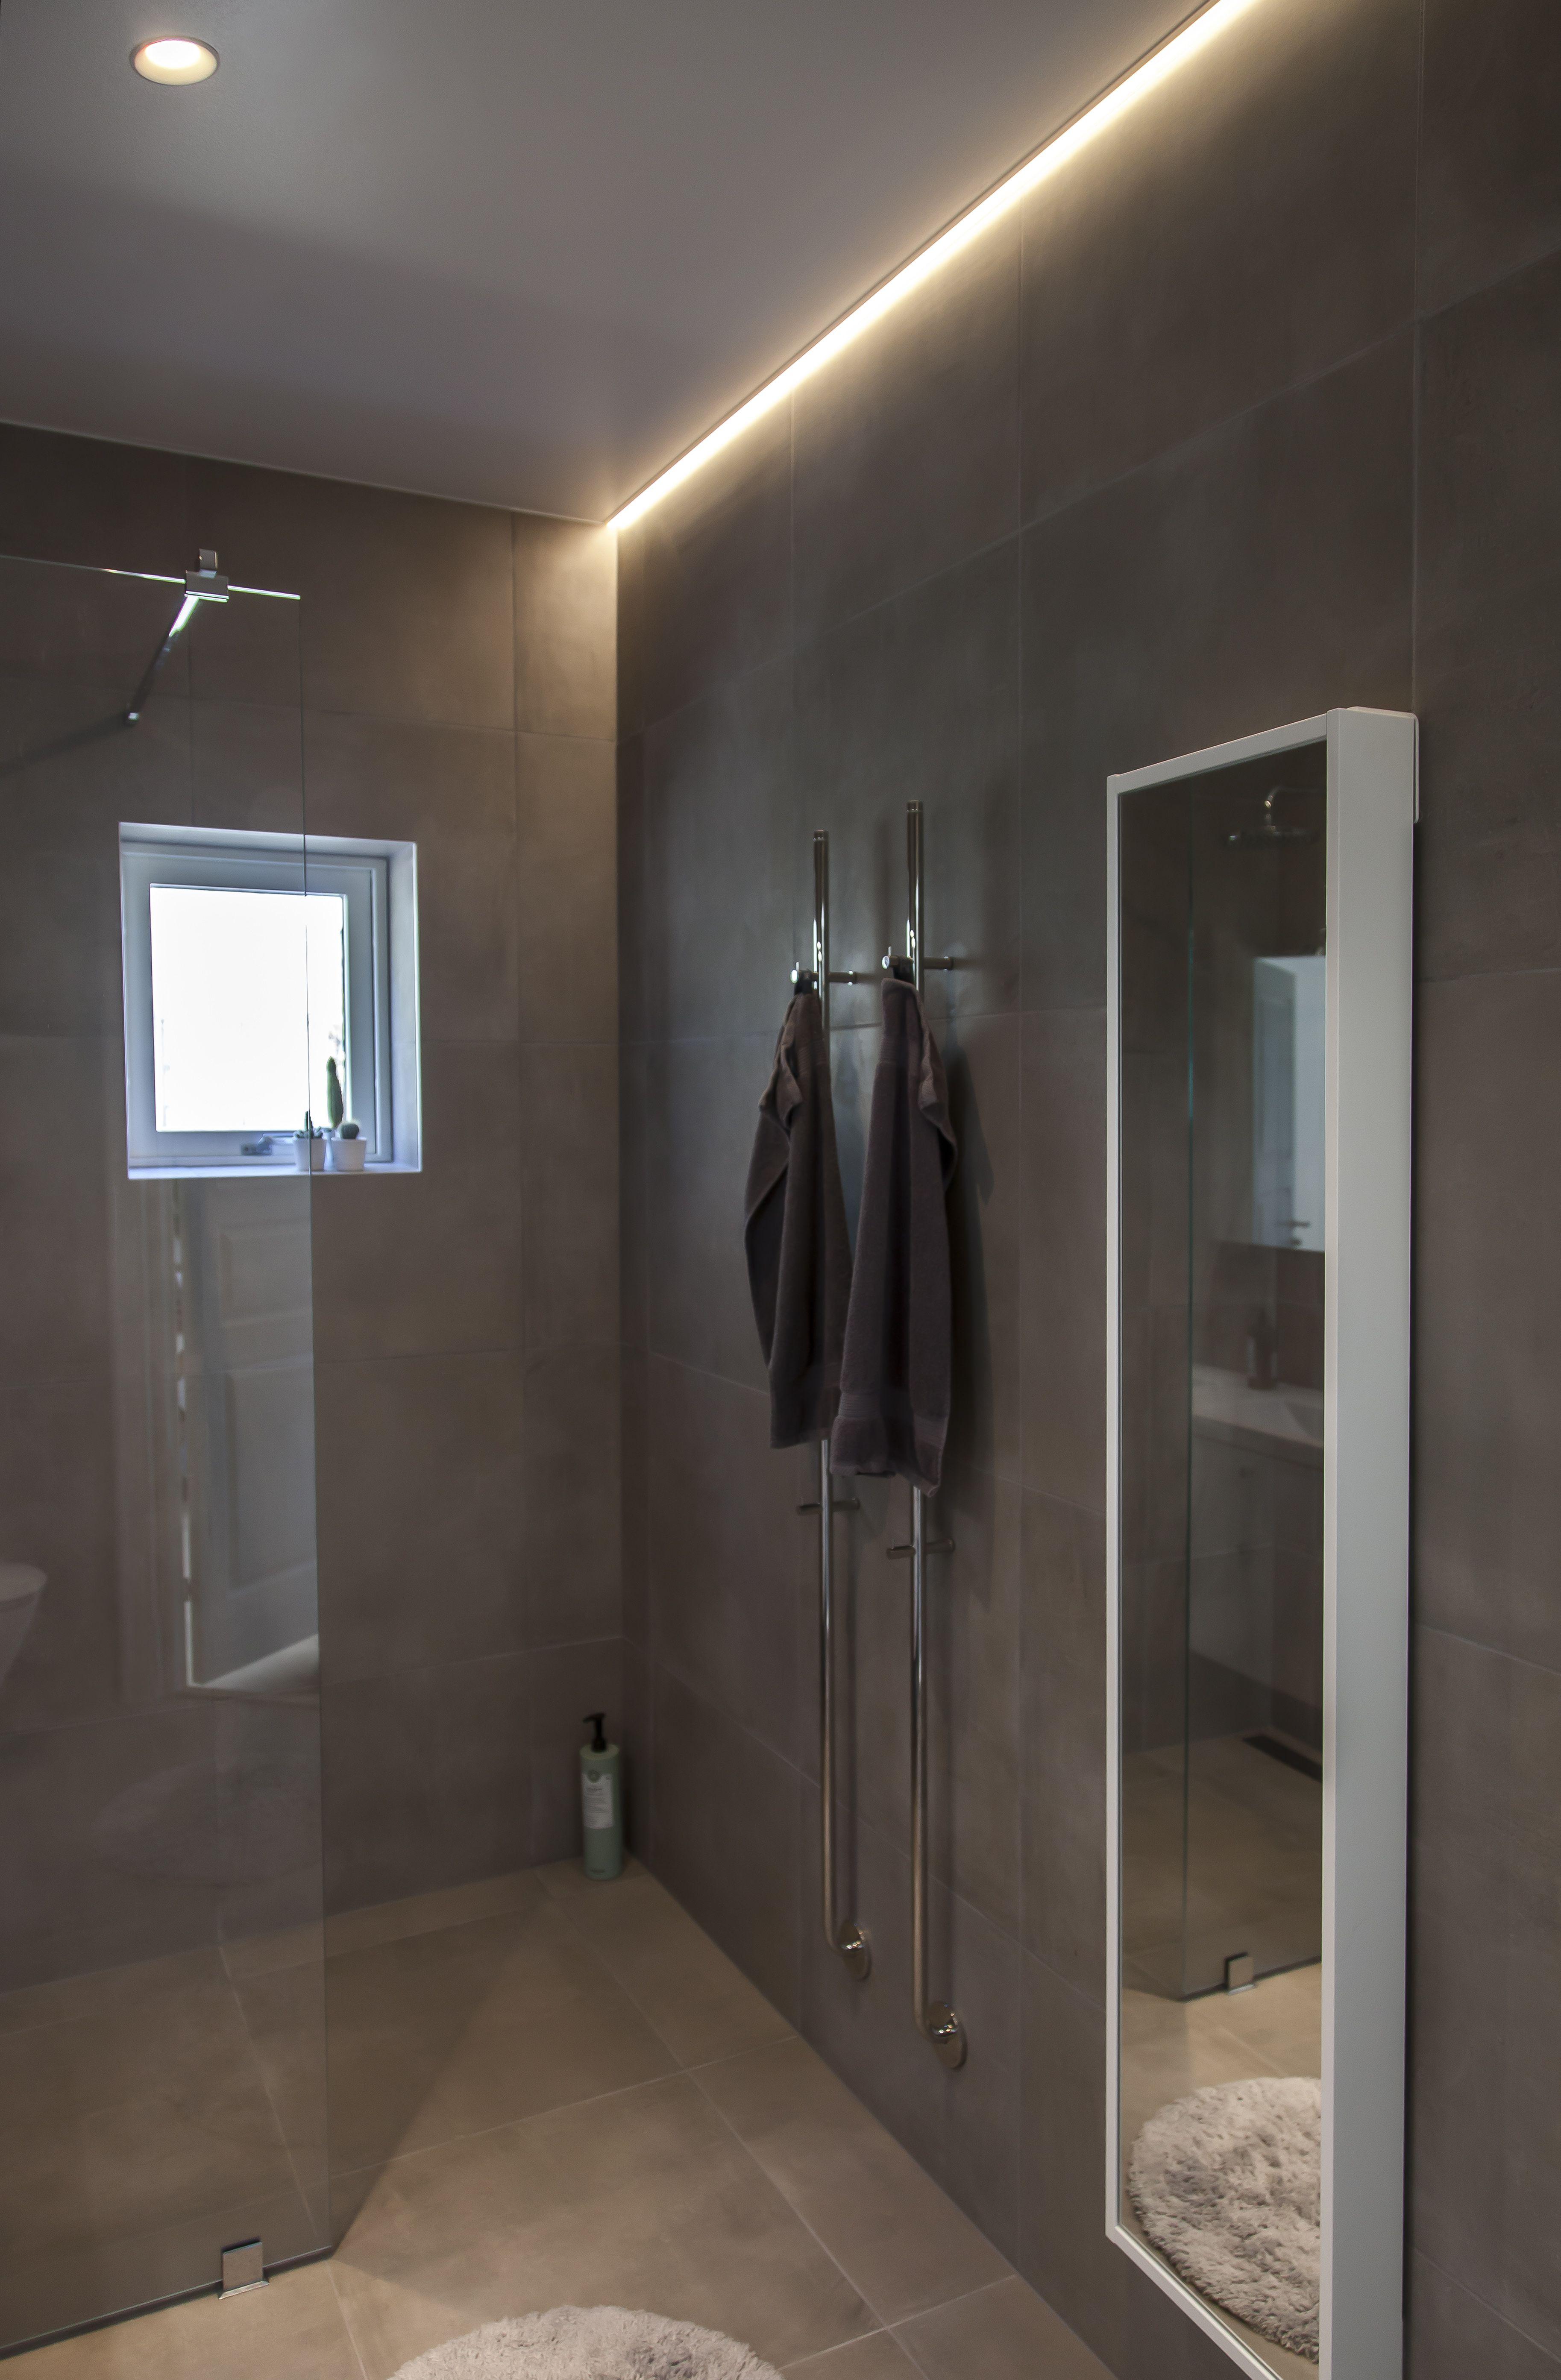 Unika Hidealite | Bathroom i 2019 | Badrum, Belysning och Utomhusbelysning JD-74